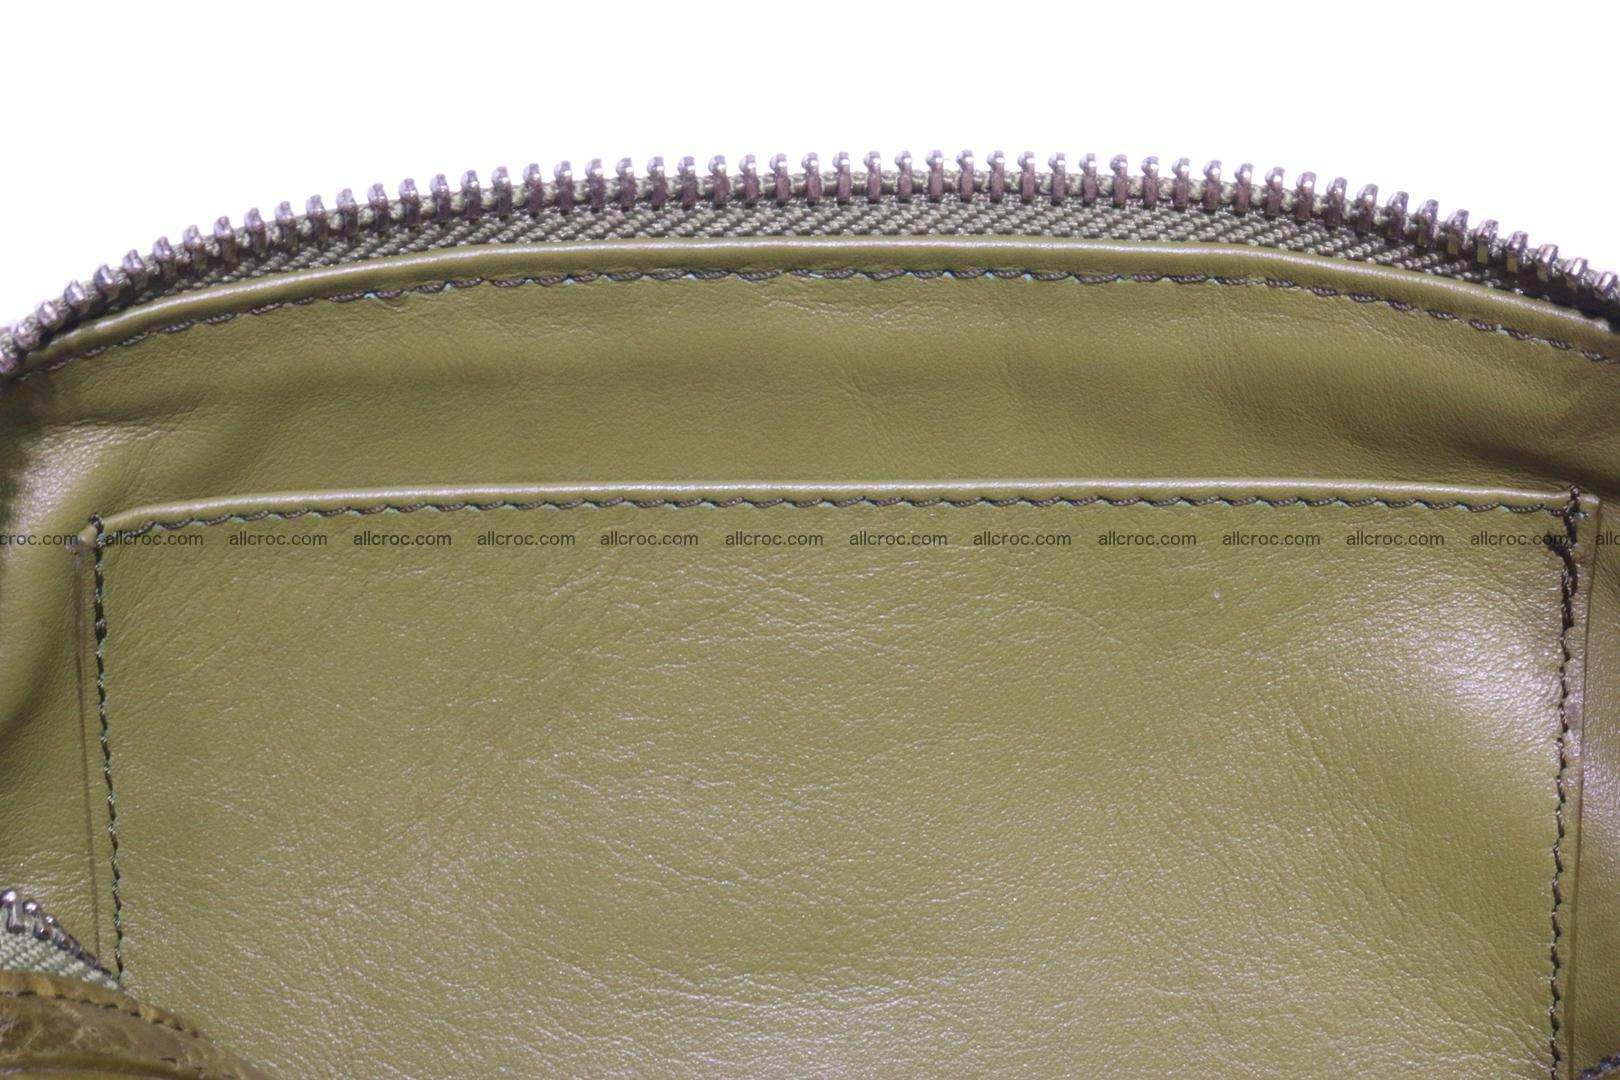 women's crocodile bag 033 Foto 12